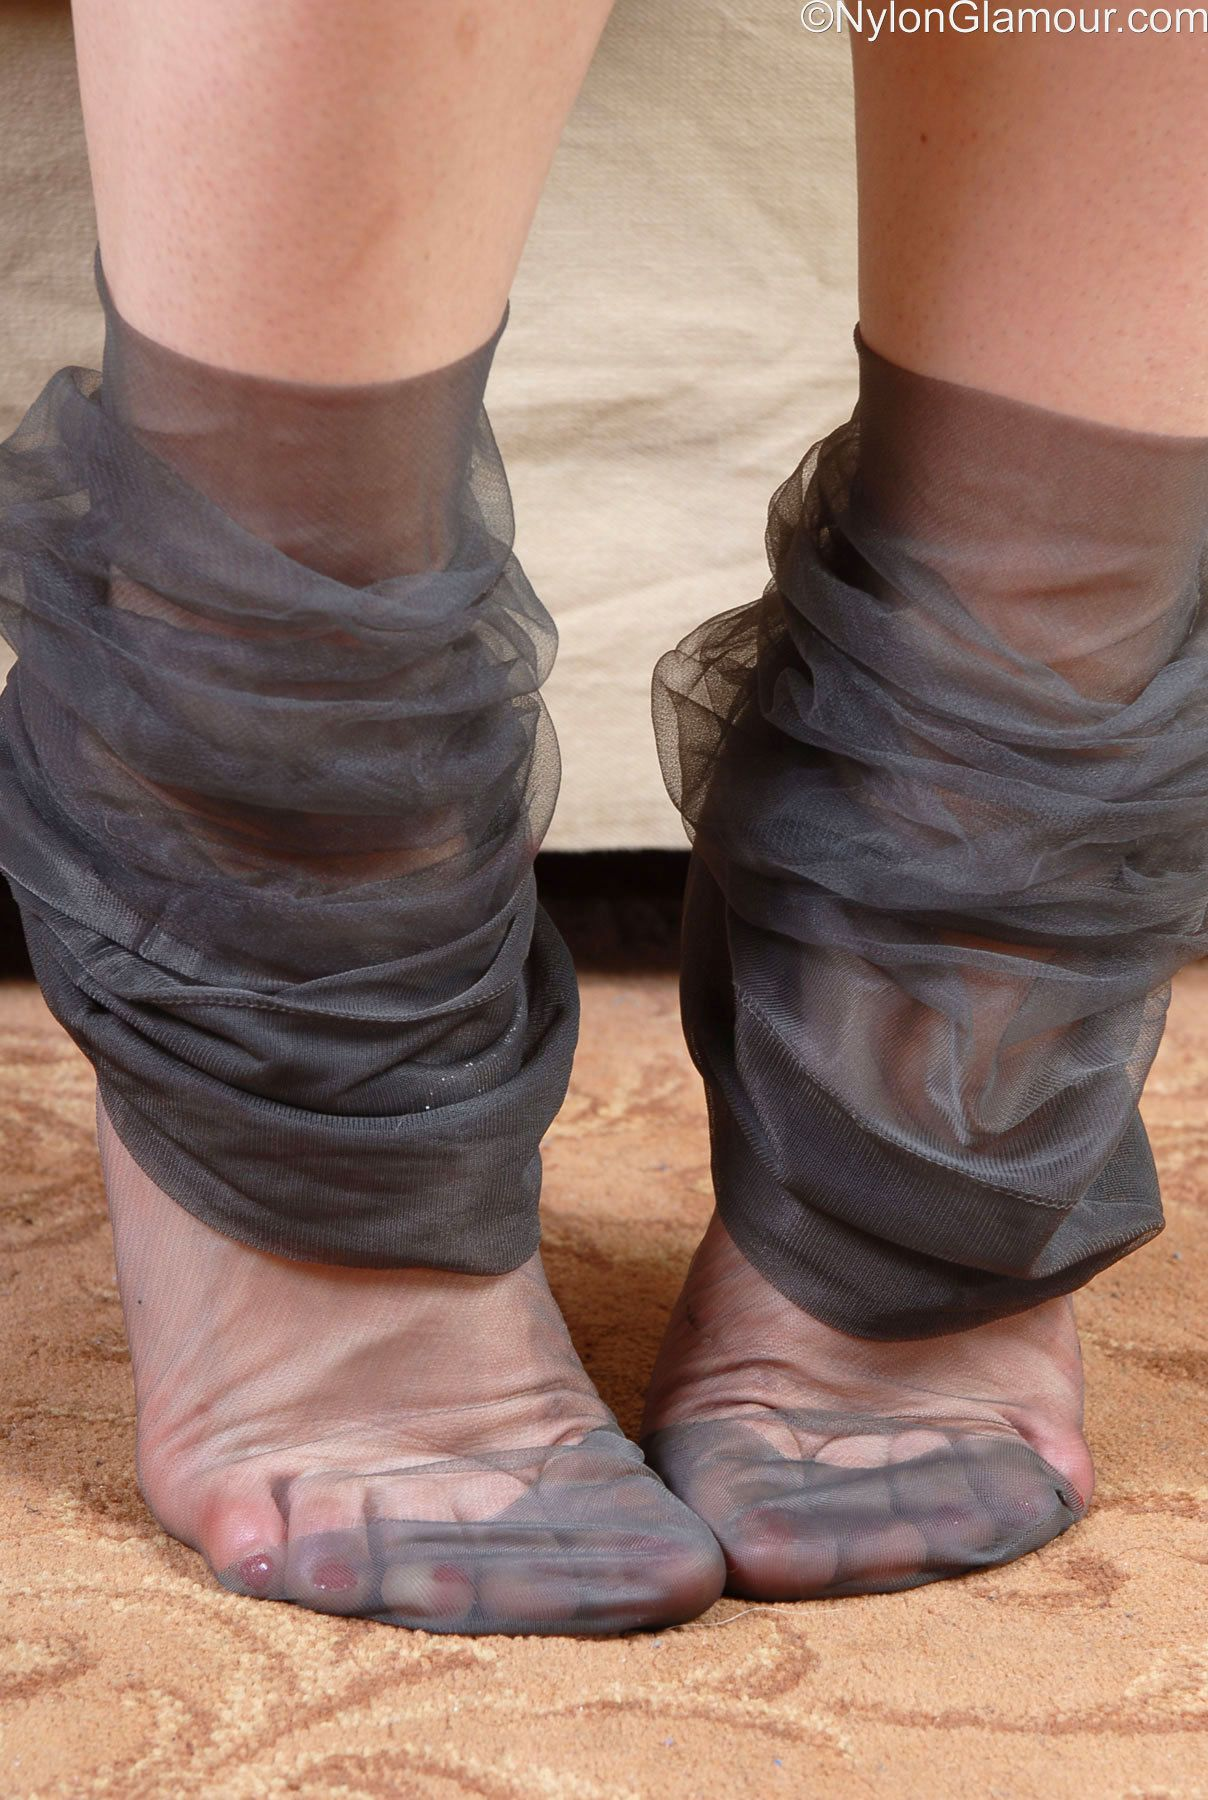 Nylon foot fetish picture